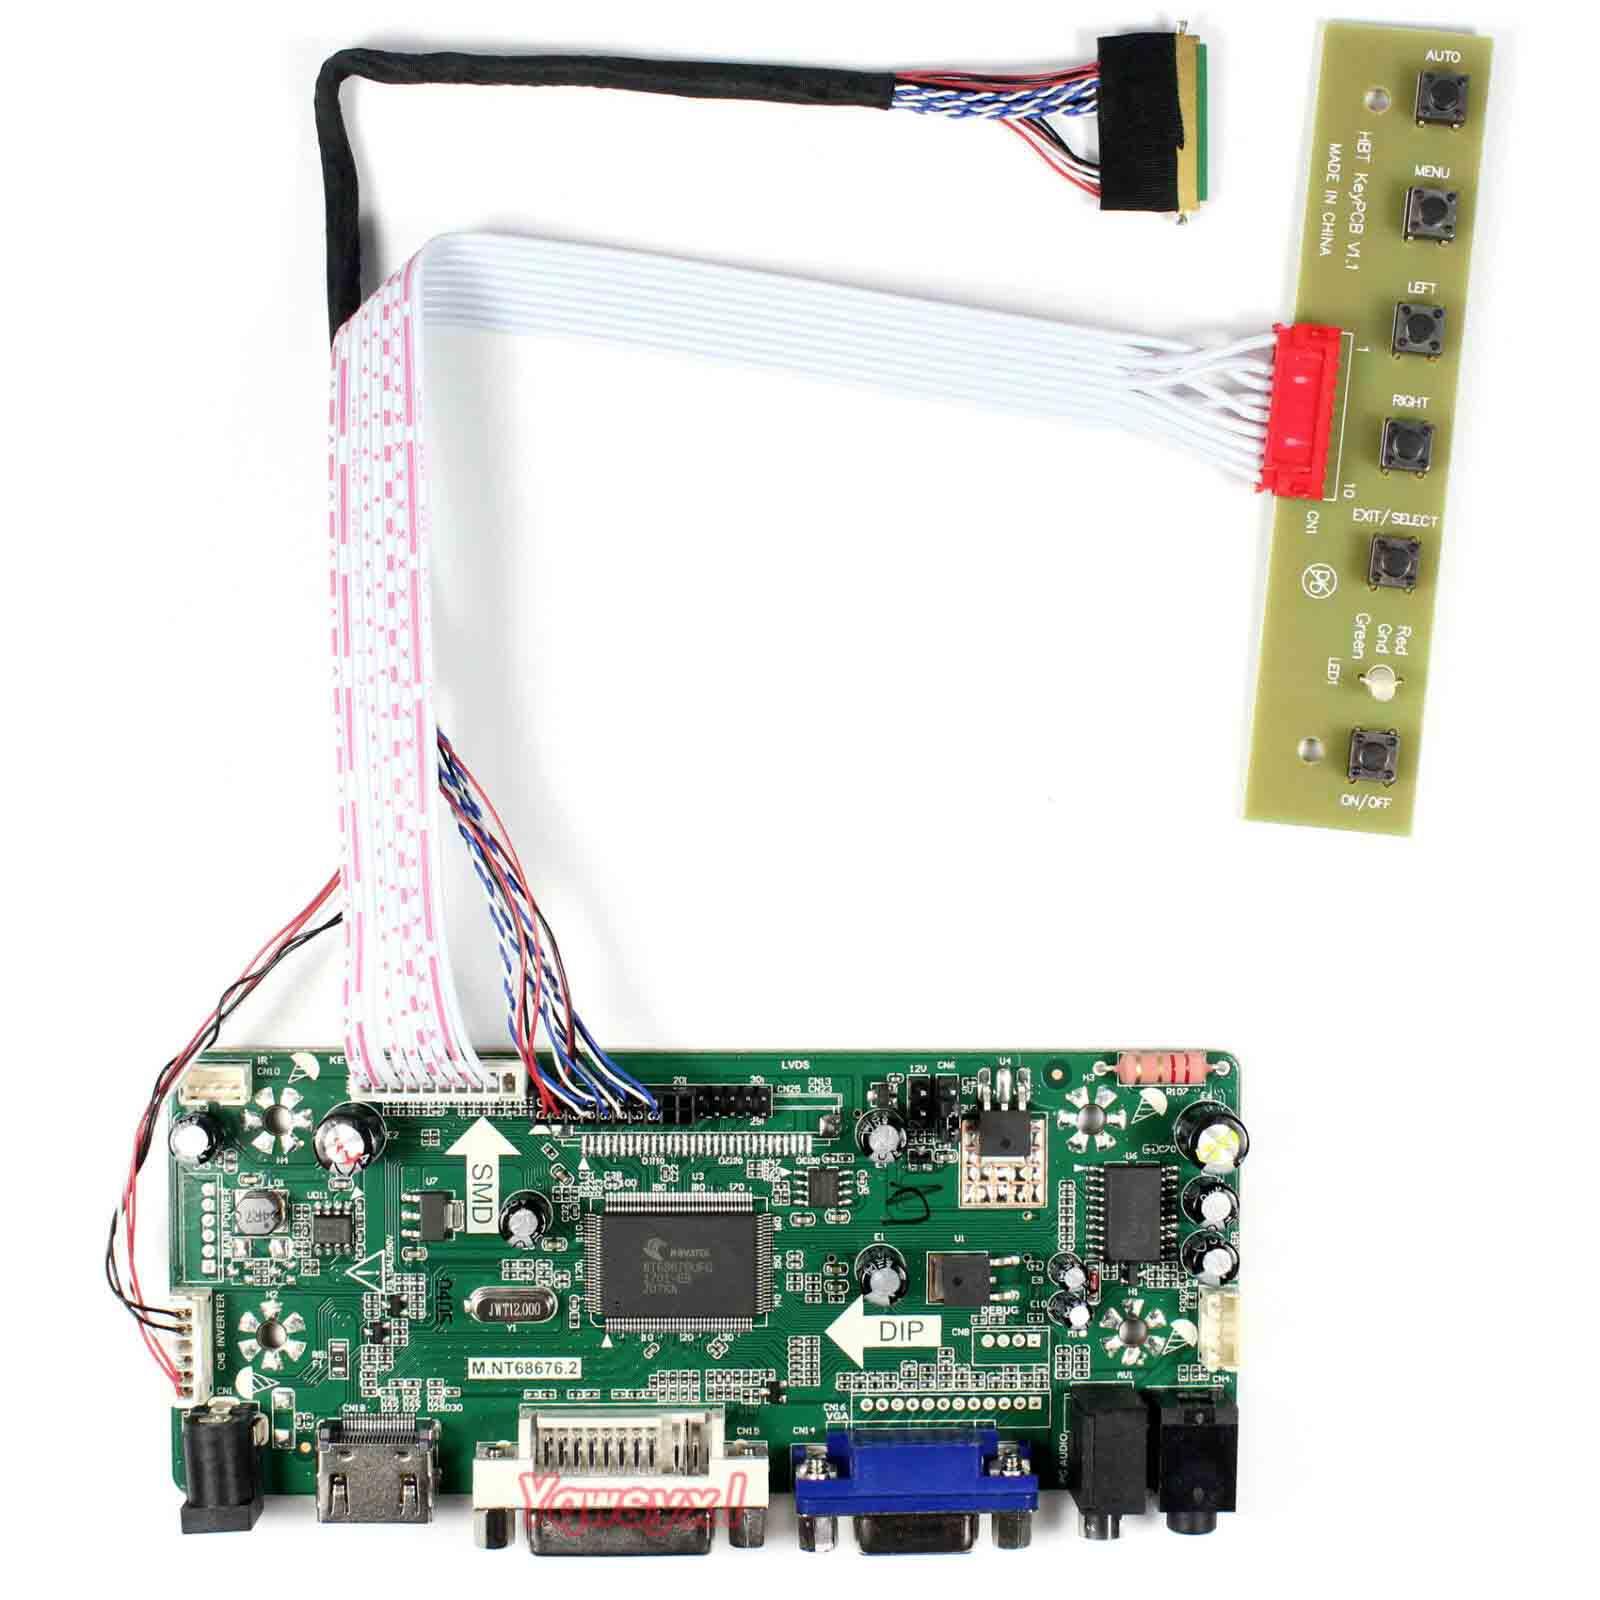 Yqwsyxl Control Board Monitor Kit for B101AW02 V.0  HDMI+ DVI+VGA LCD LED  screen Controller Board Driver